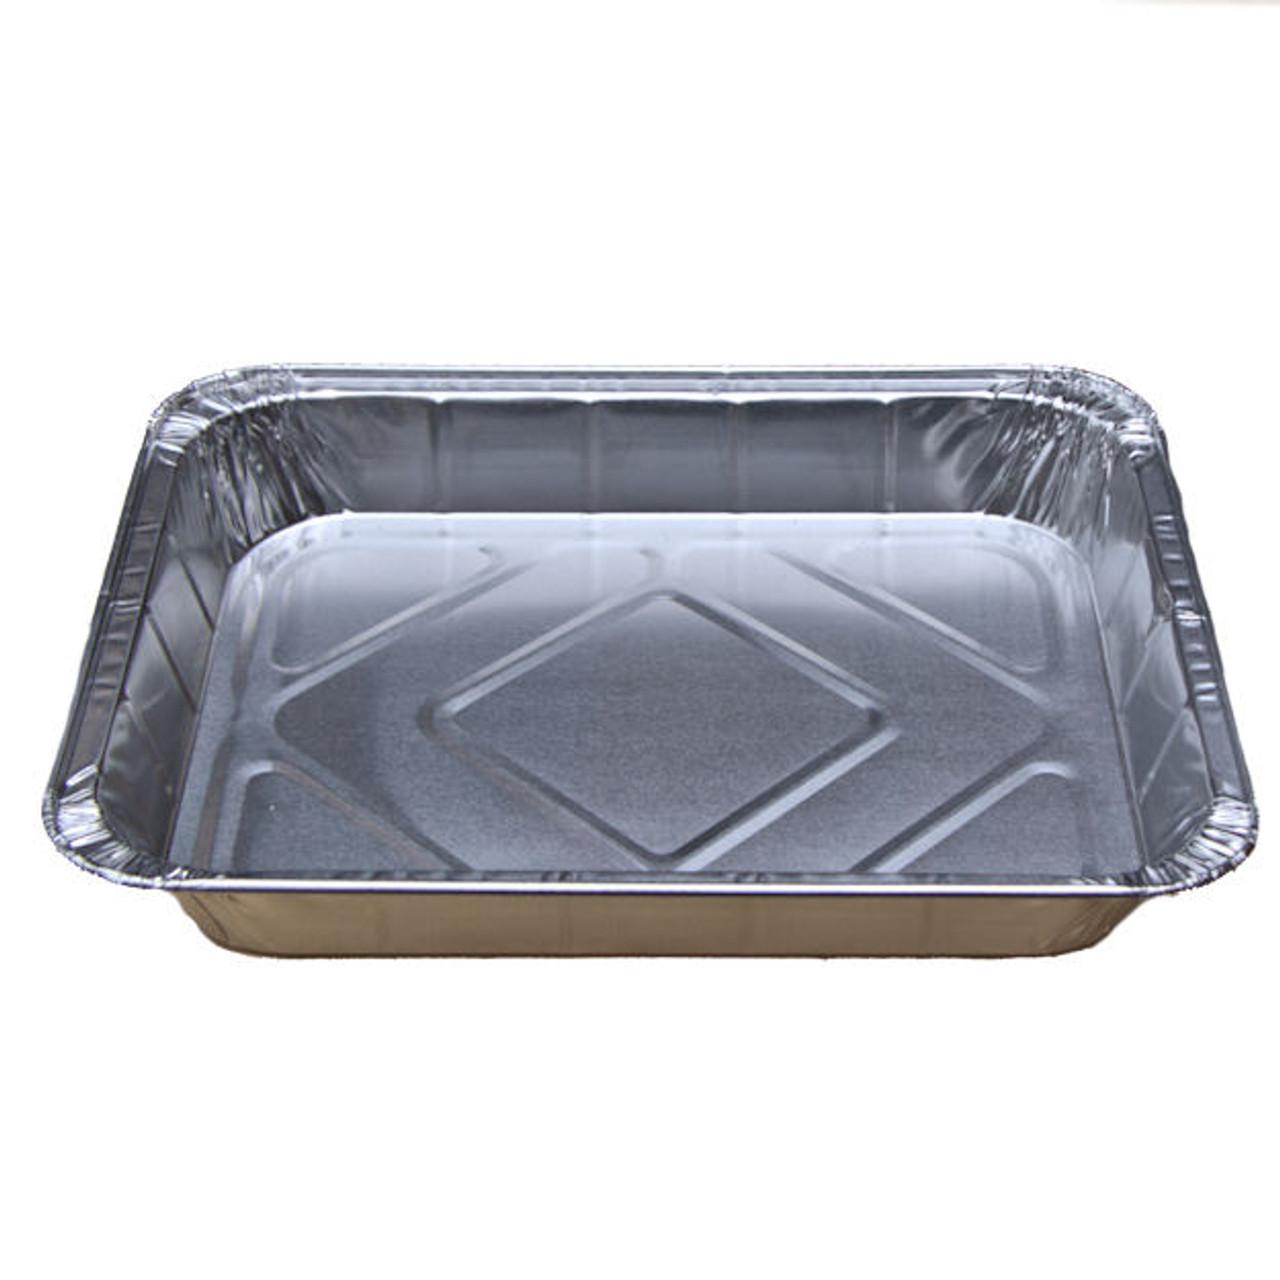 "Large Foil Baking/ Roasting Tray ( 320 x 260 x 40mm ) 121/2""x 101/4""x 11/2"""